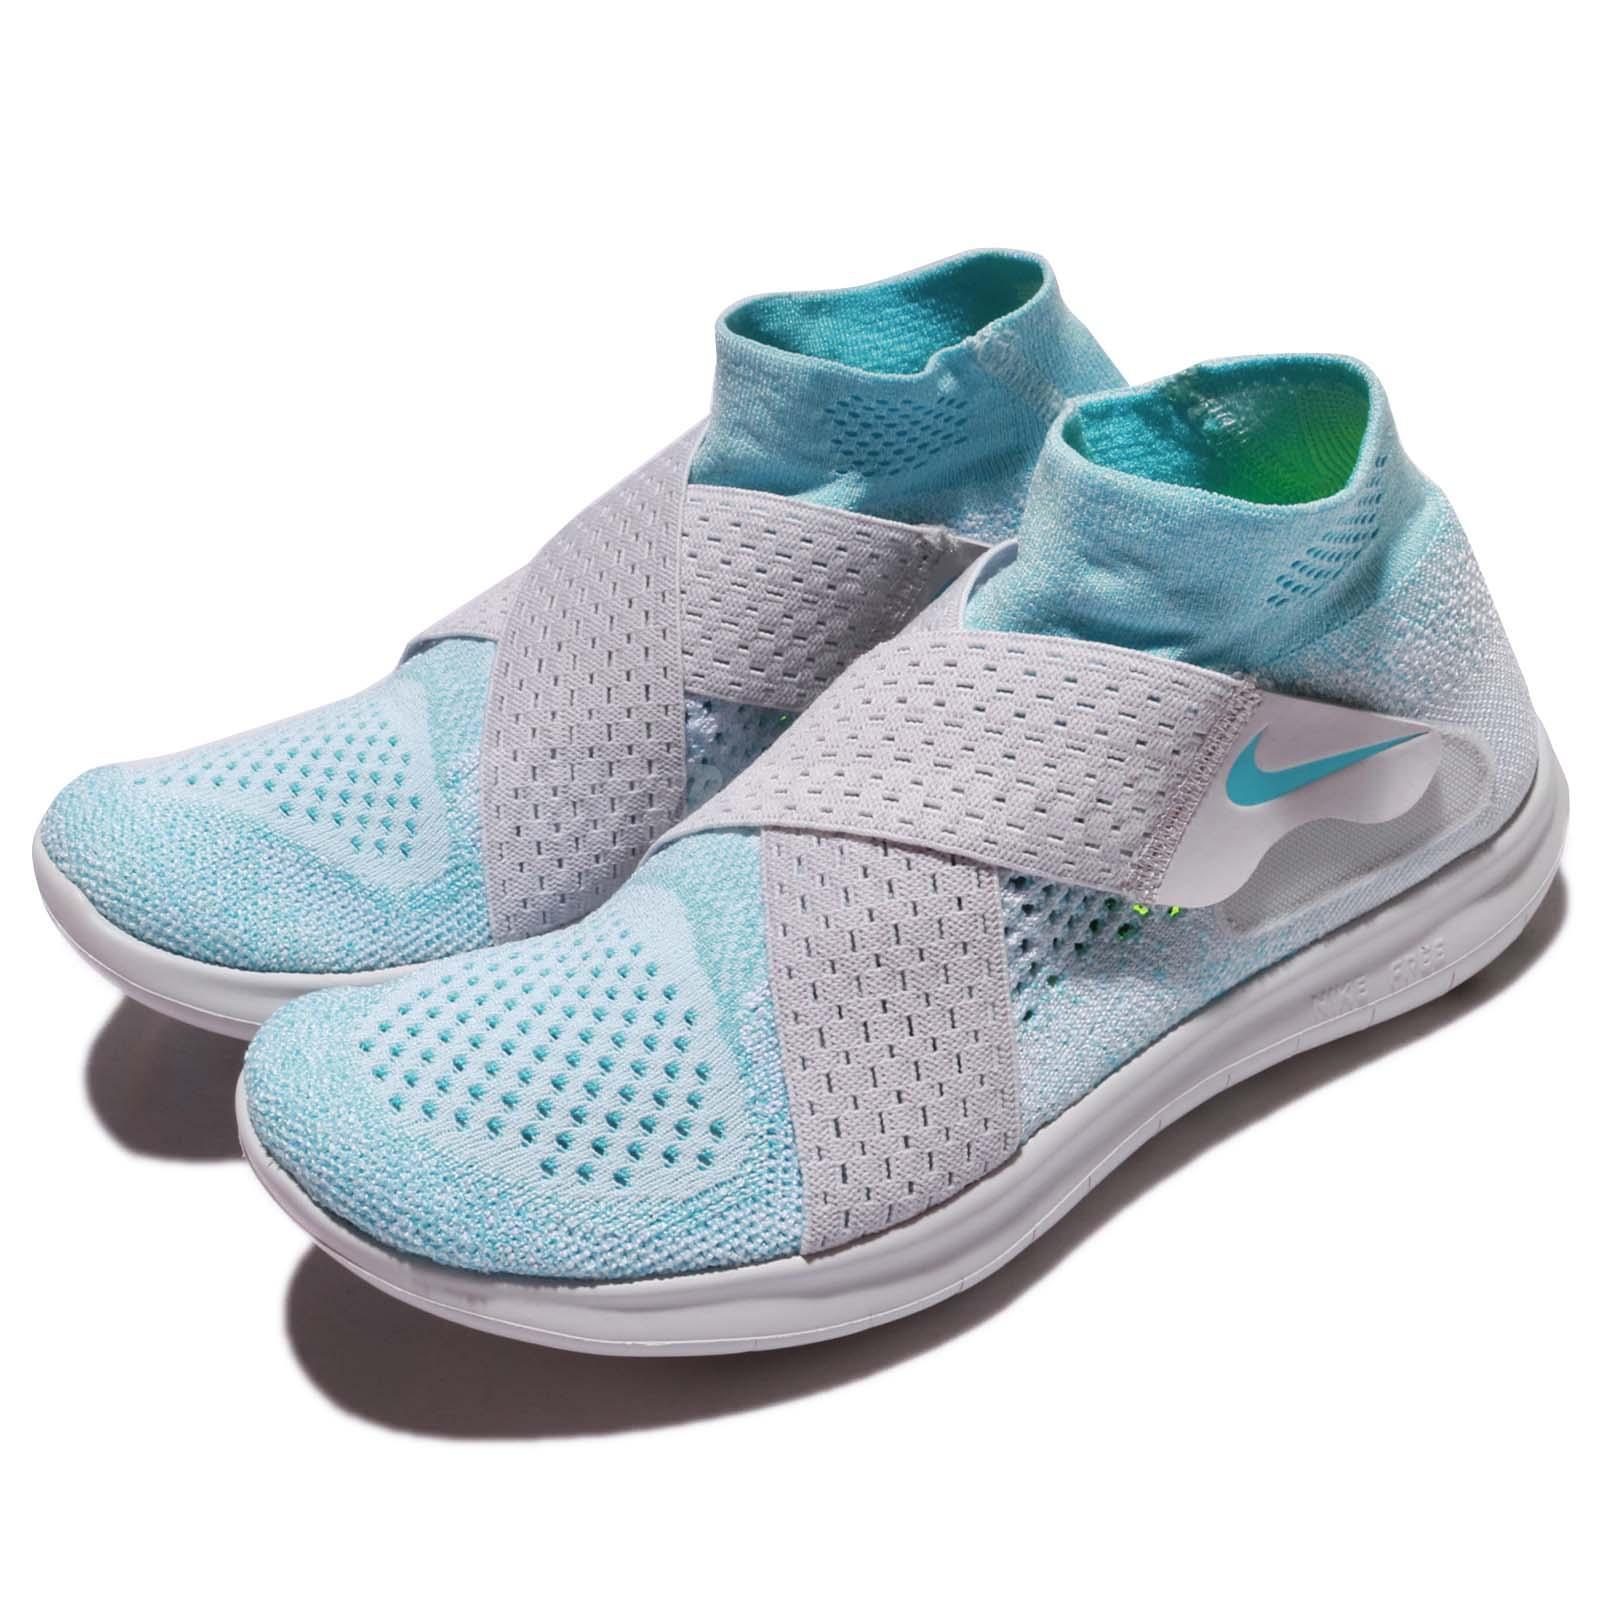 00369d35228 Details about Wmns Nike Free RN Motion FK 2017 Flyknit Glacier Blue Women  Running 880846-402